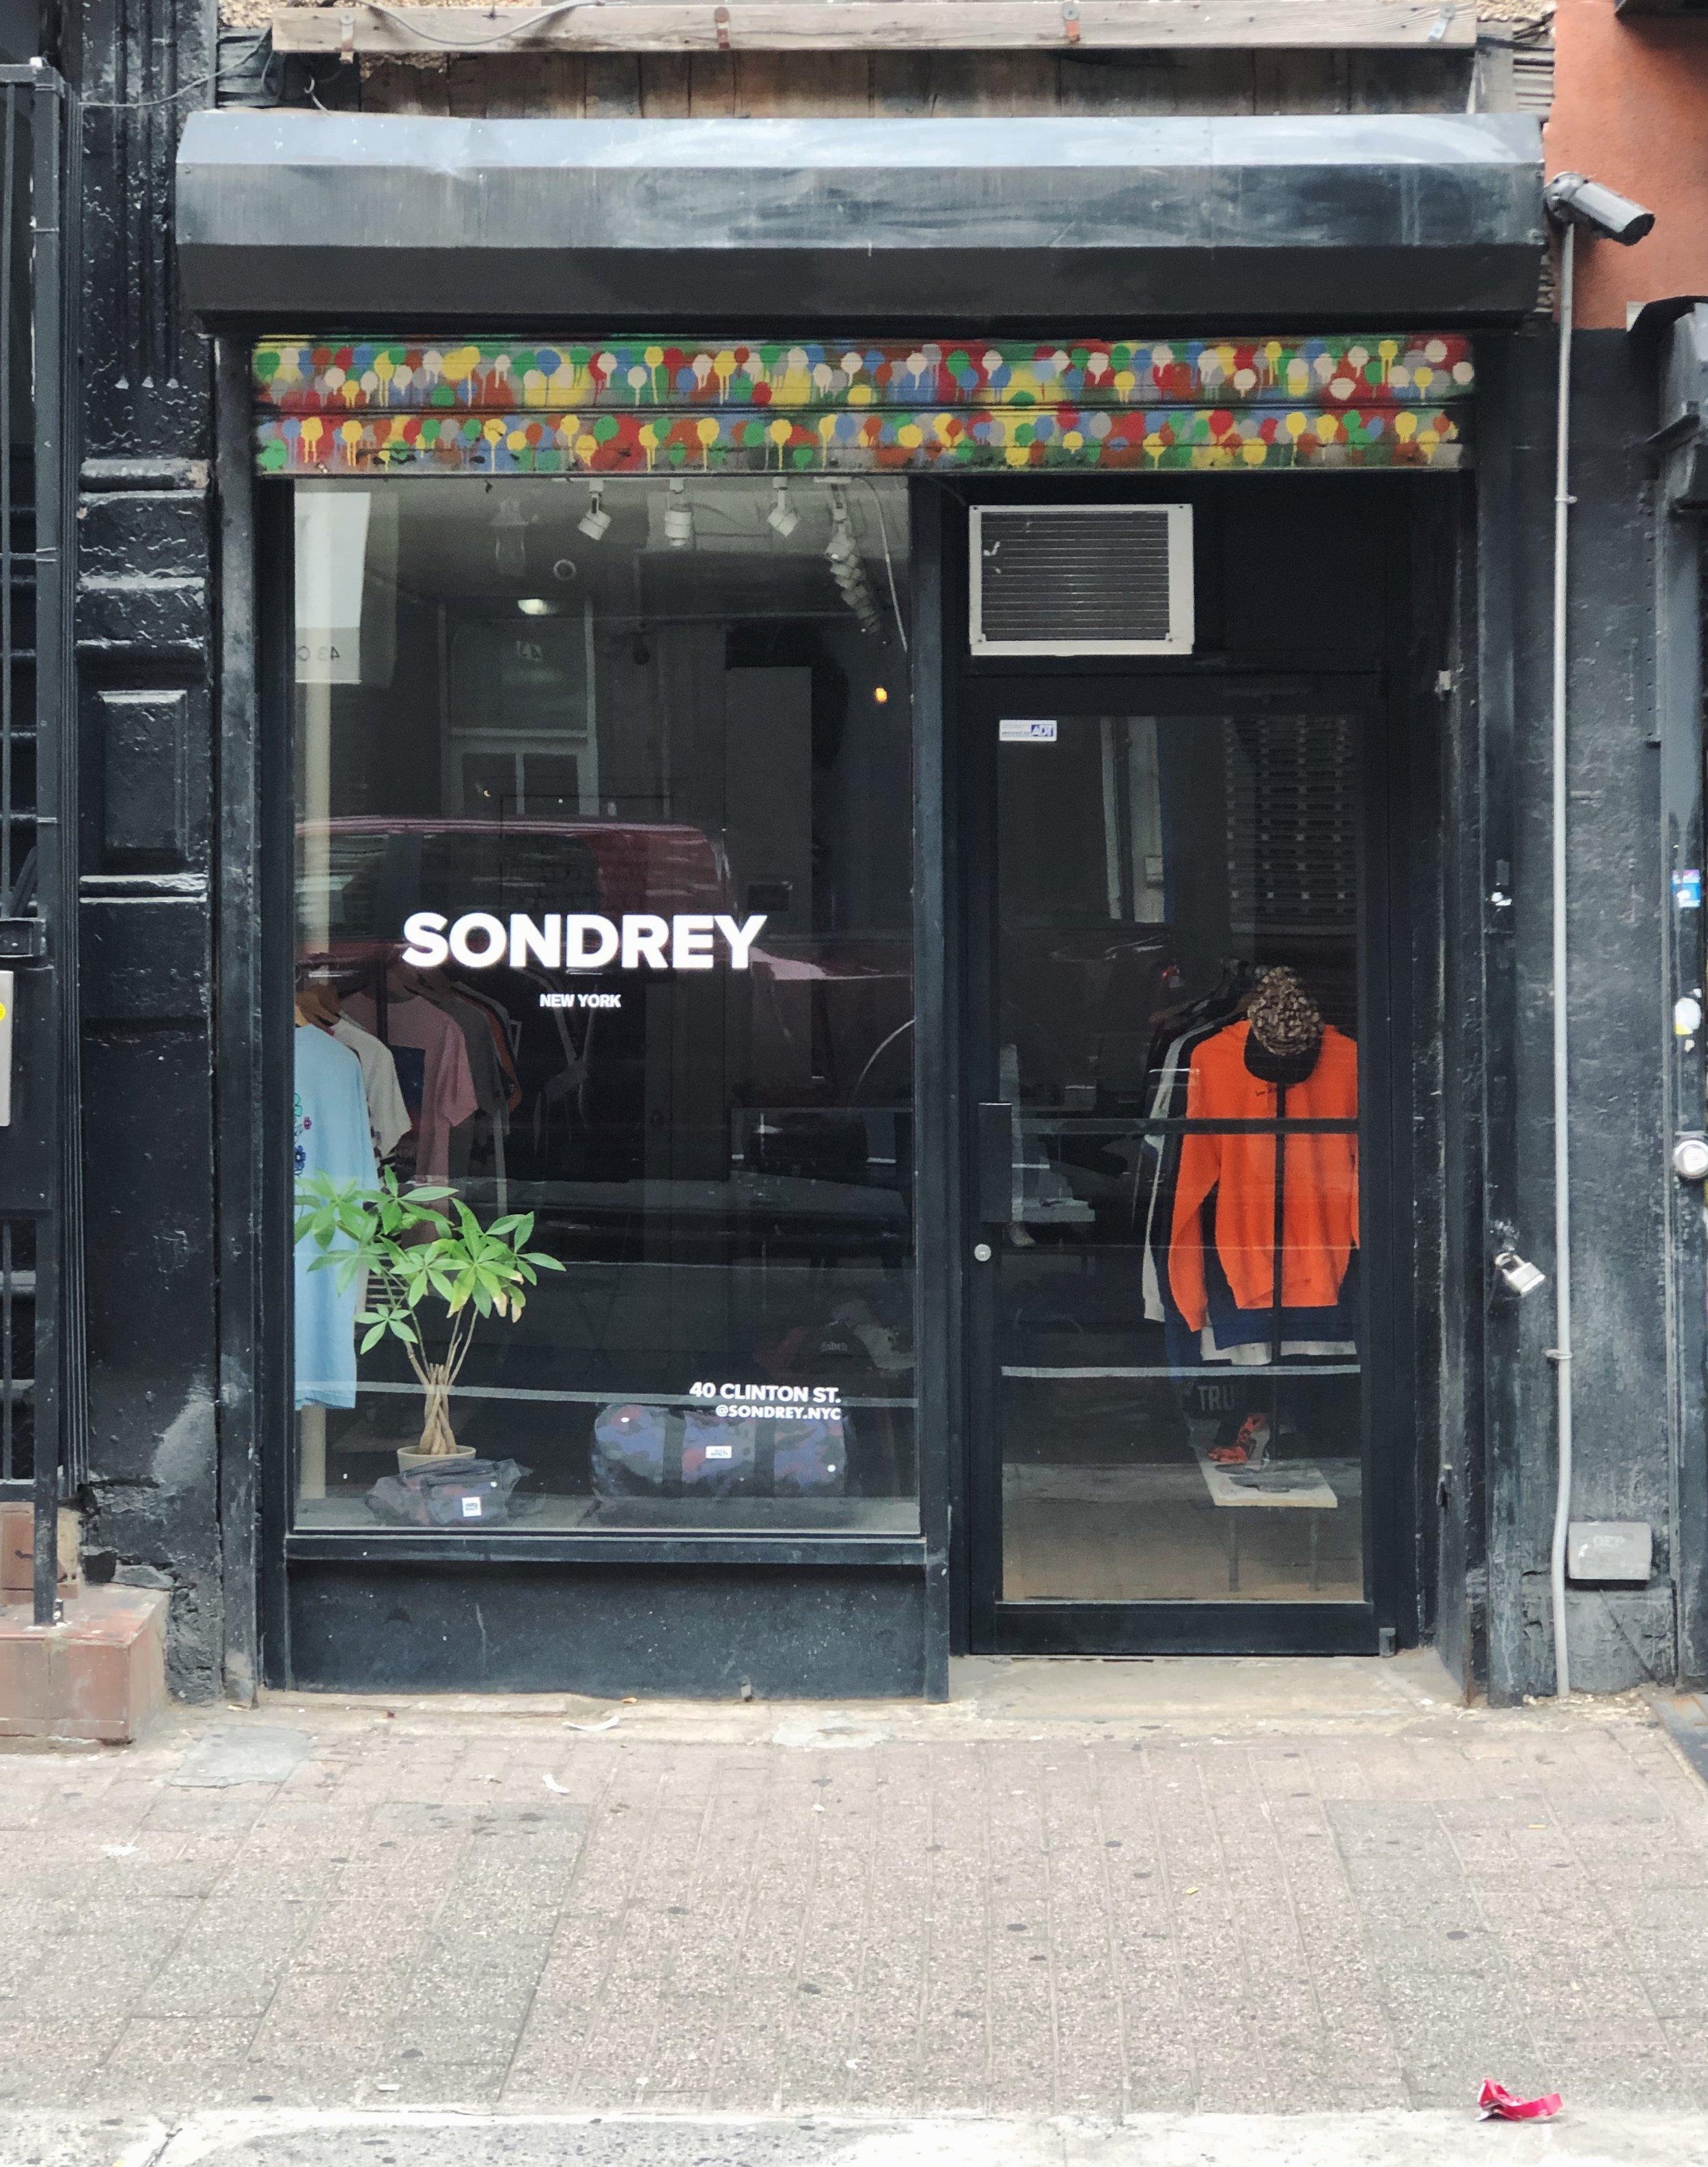 Sondrey NYC - 40 Clinton Street, New York City, NY, 10002Store Hours:Monday-Saturday 1230pm-8pmSunday 12:30pm-6:00pm